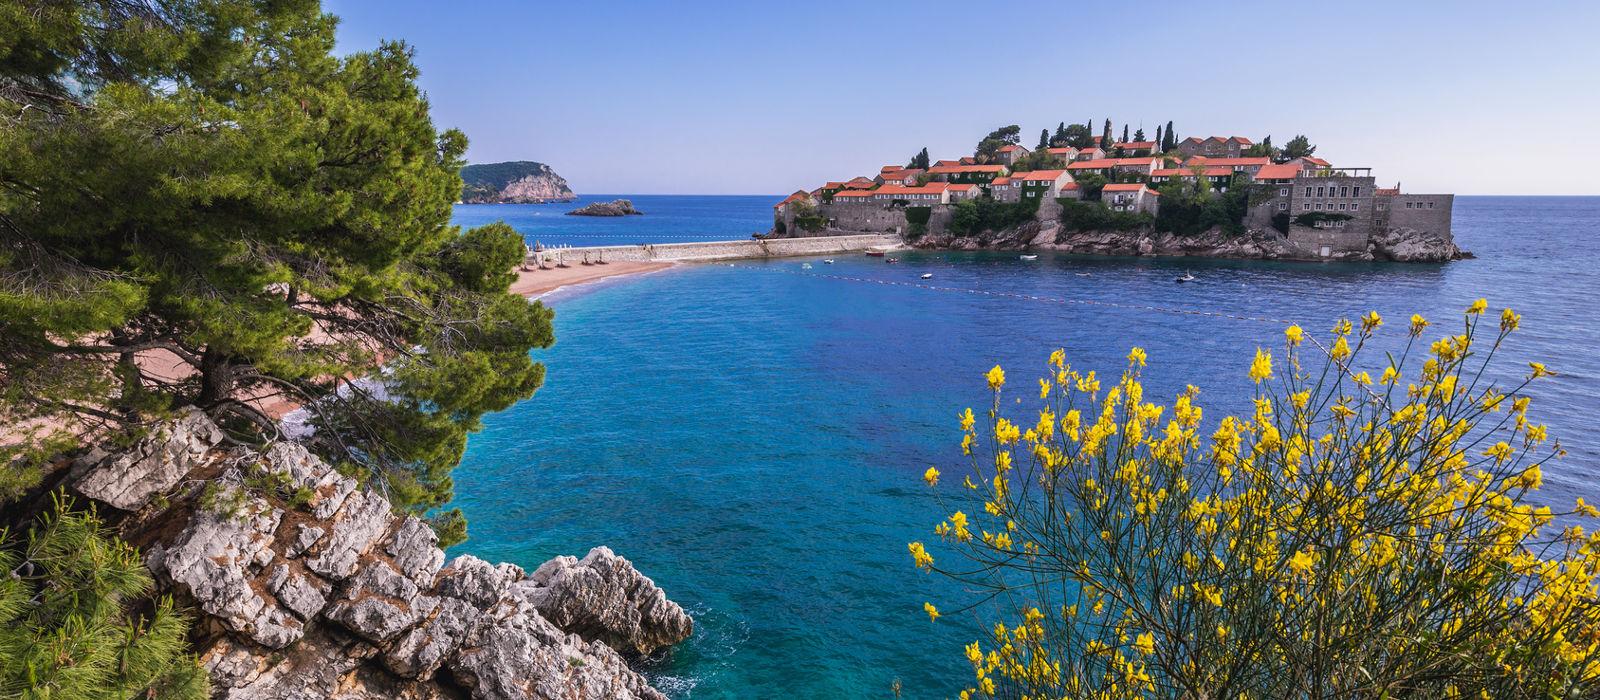 Luxusreise Montenegro, Rundreise Montenegro